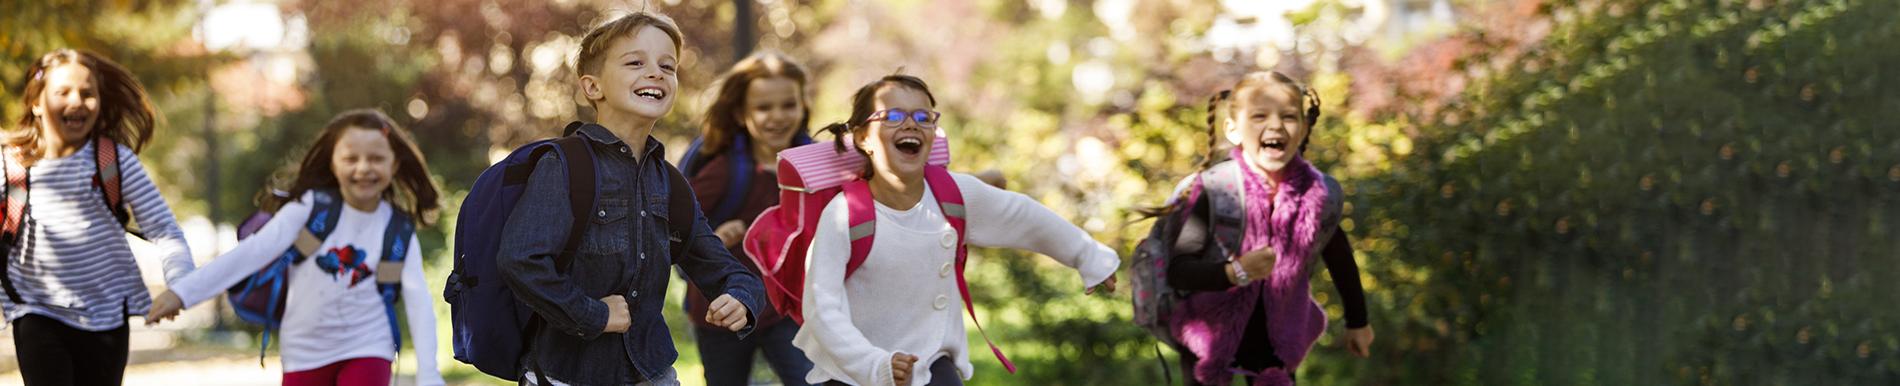 https://www.healthychildren.org/SiteCollectionImage-Homepage-Banners/BacktoSchoolBanner_es.jpg